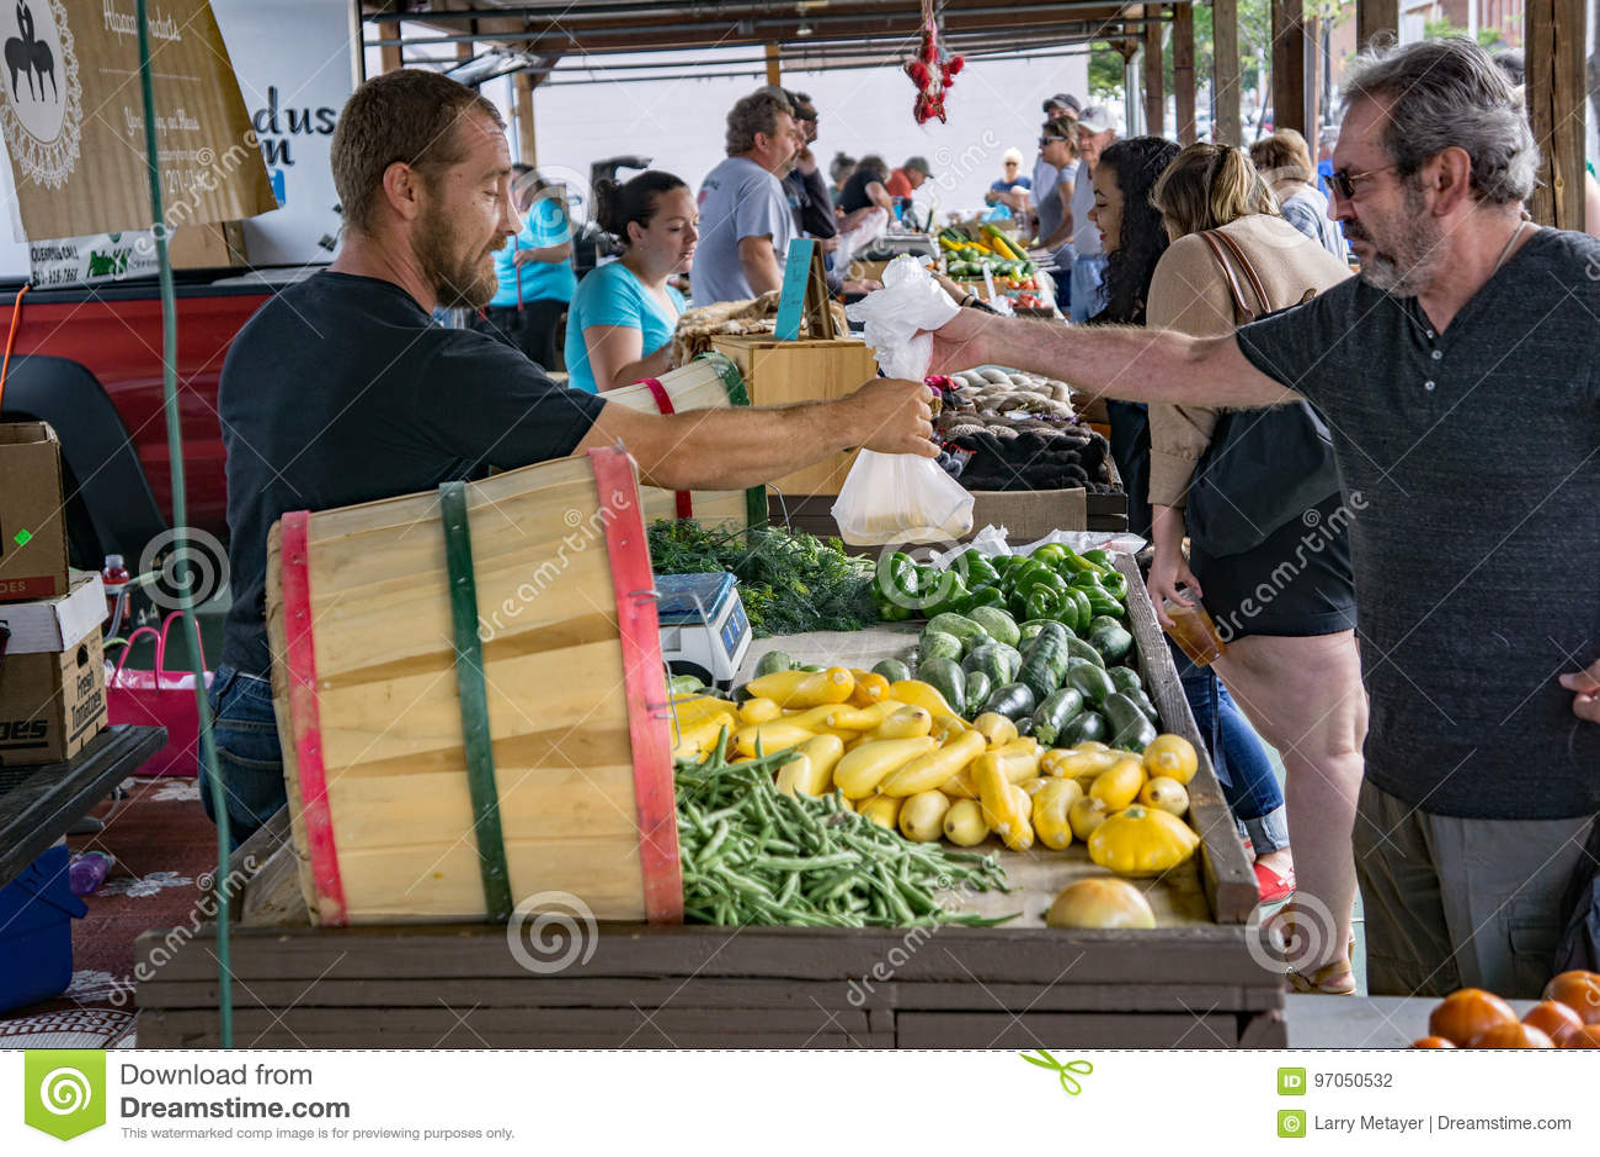 Male Shopper at the Salem Farmers Market